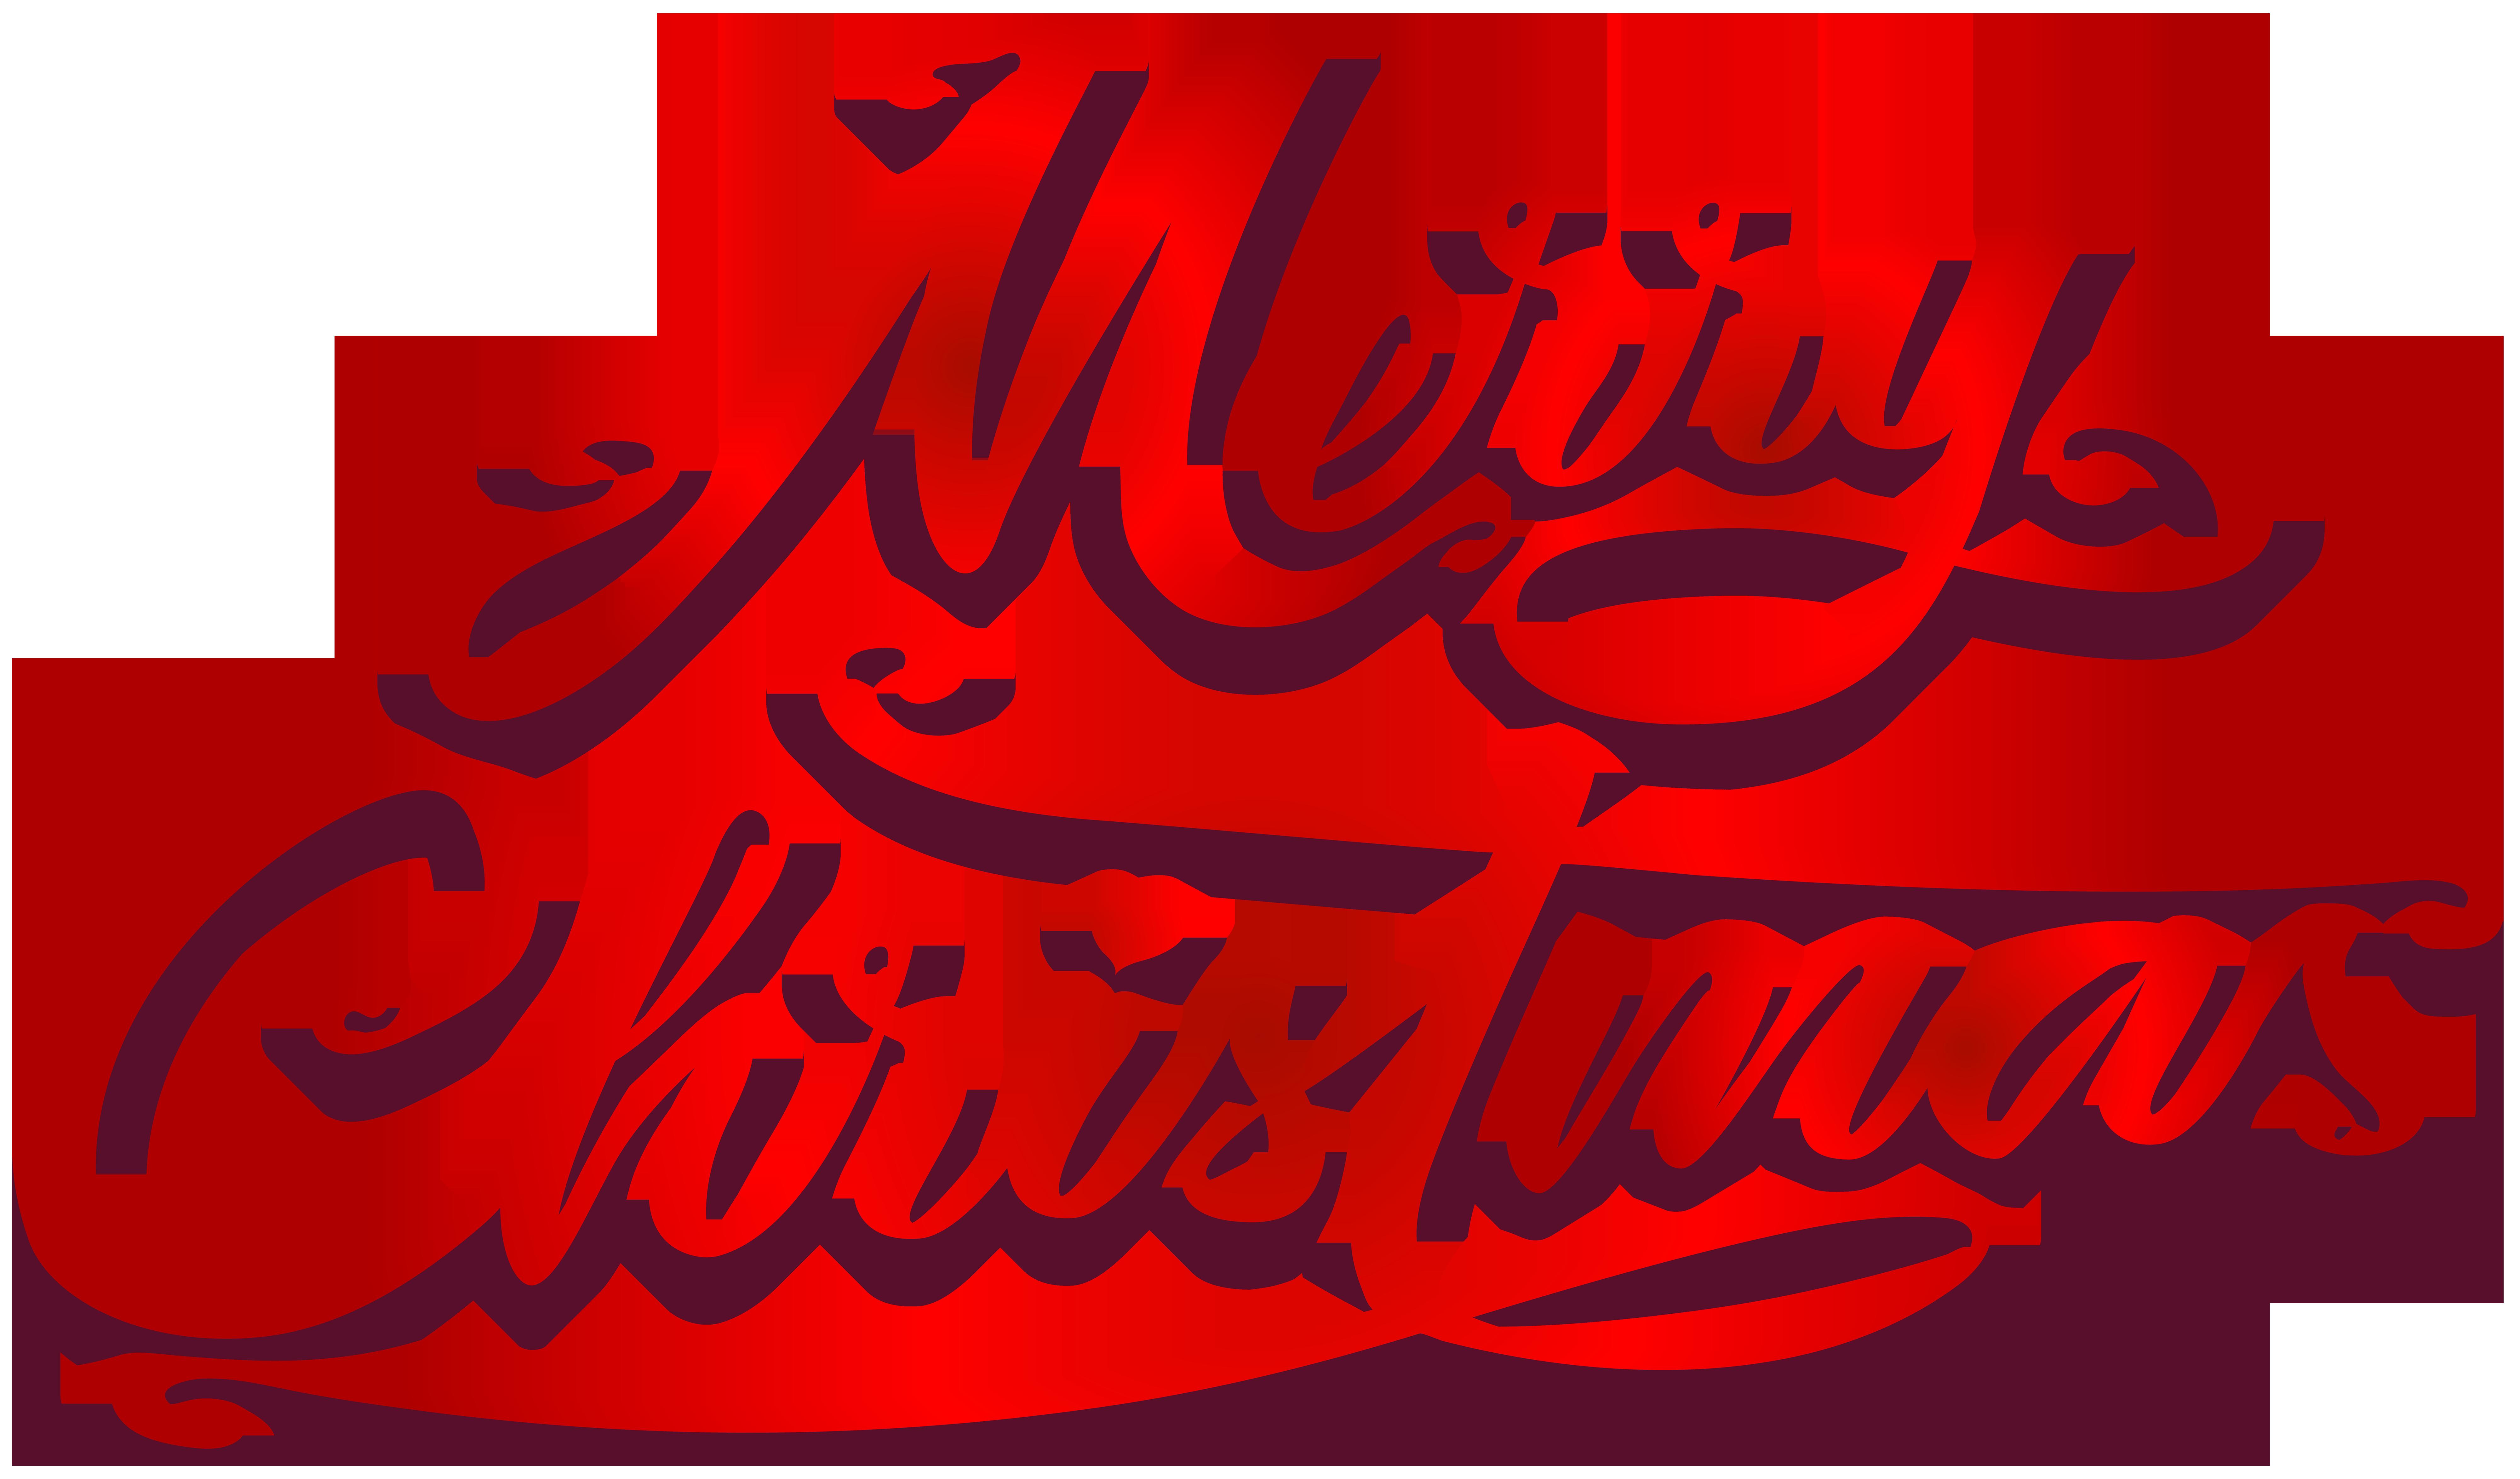 8000x4696 Merry Christmas Text Png Clip Art Imageu200b Gallery Yopriceville